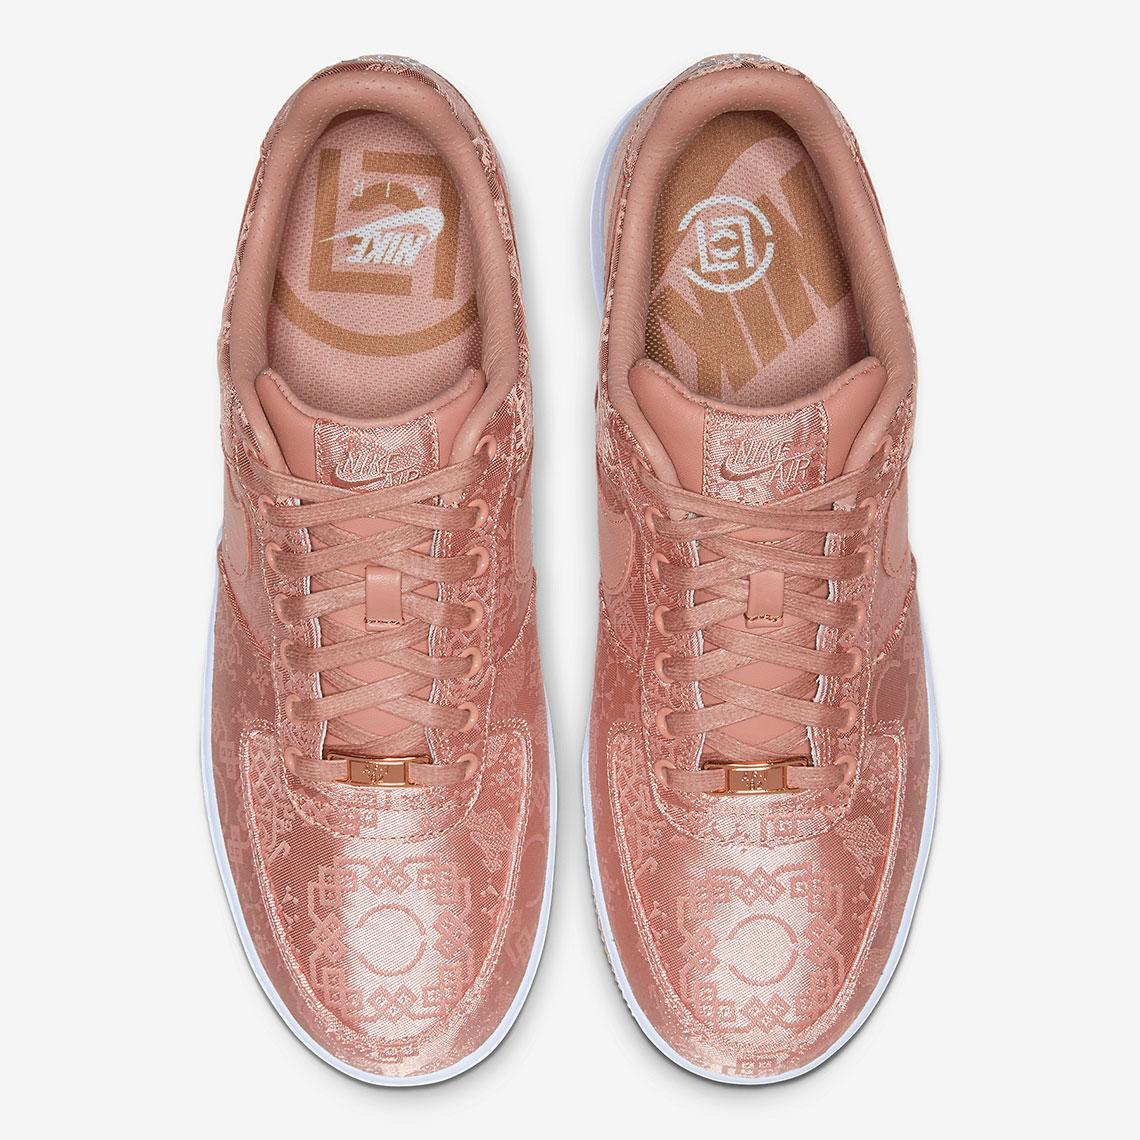 CLOT Nike Air Force 1 Rose Gold Silk Release Date | SneakerNews.com